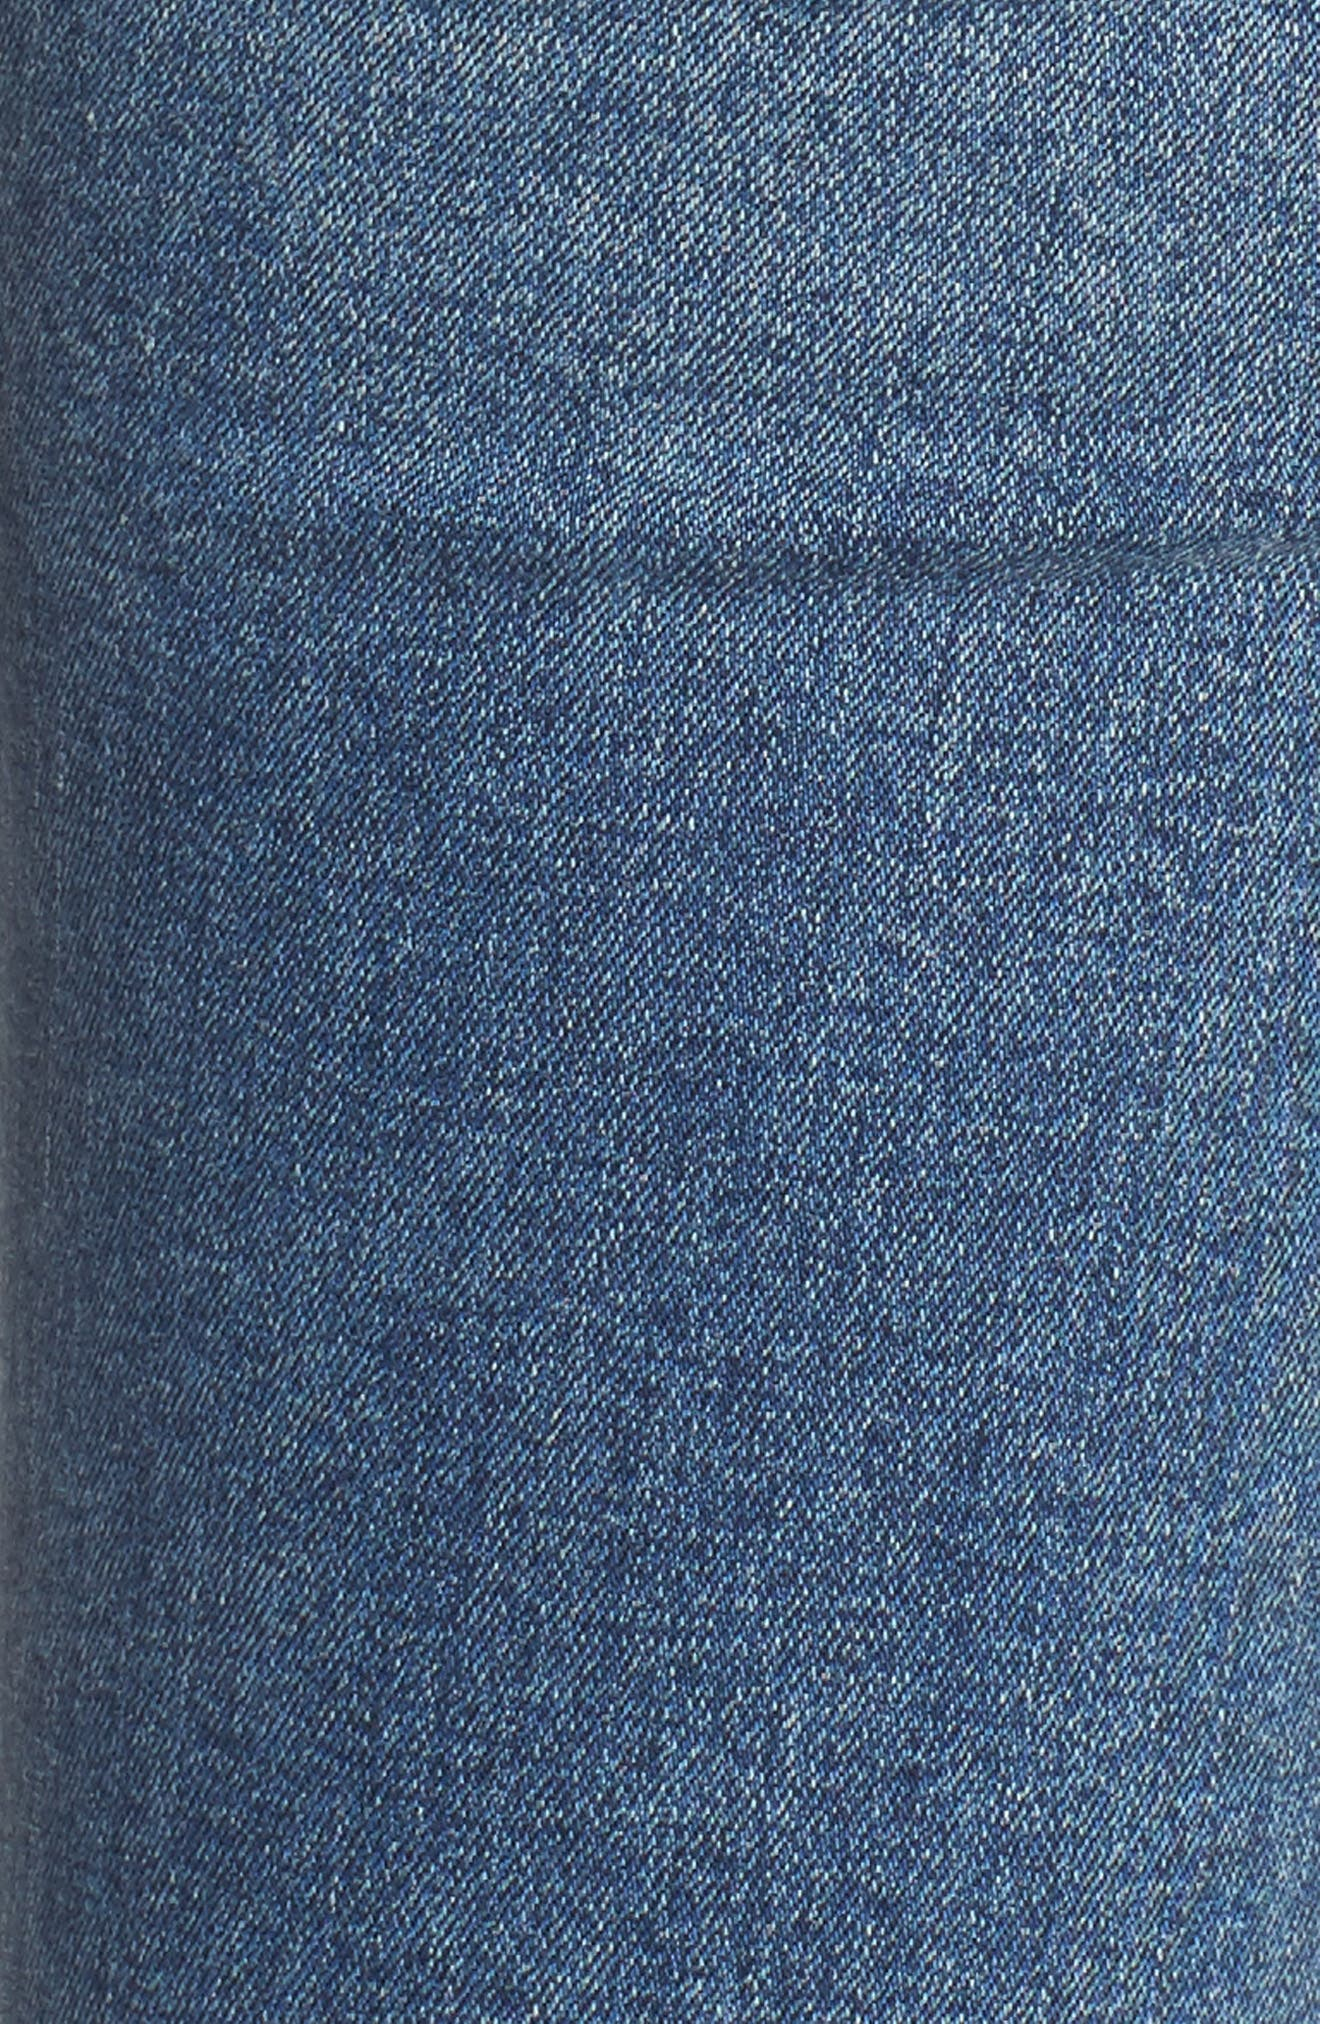 Rocket Crop Skinny Jeans,                             Alternate thumbnail 6, color,                             Orbit